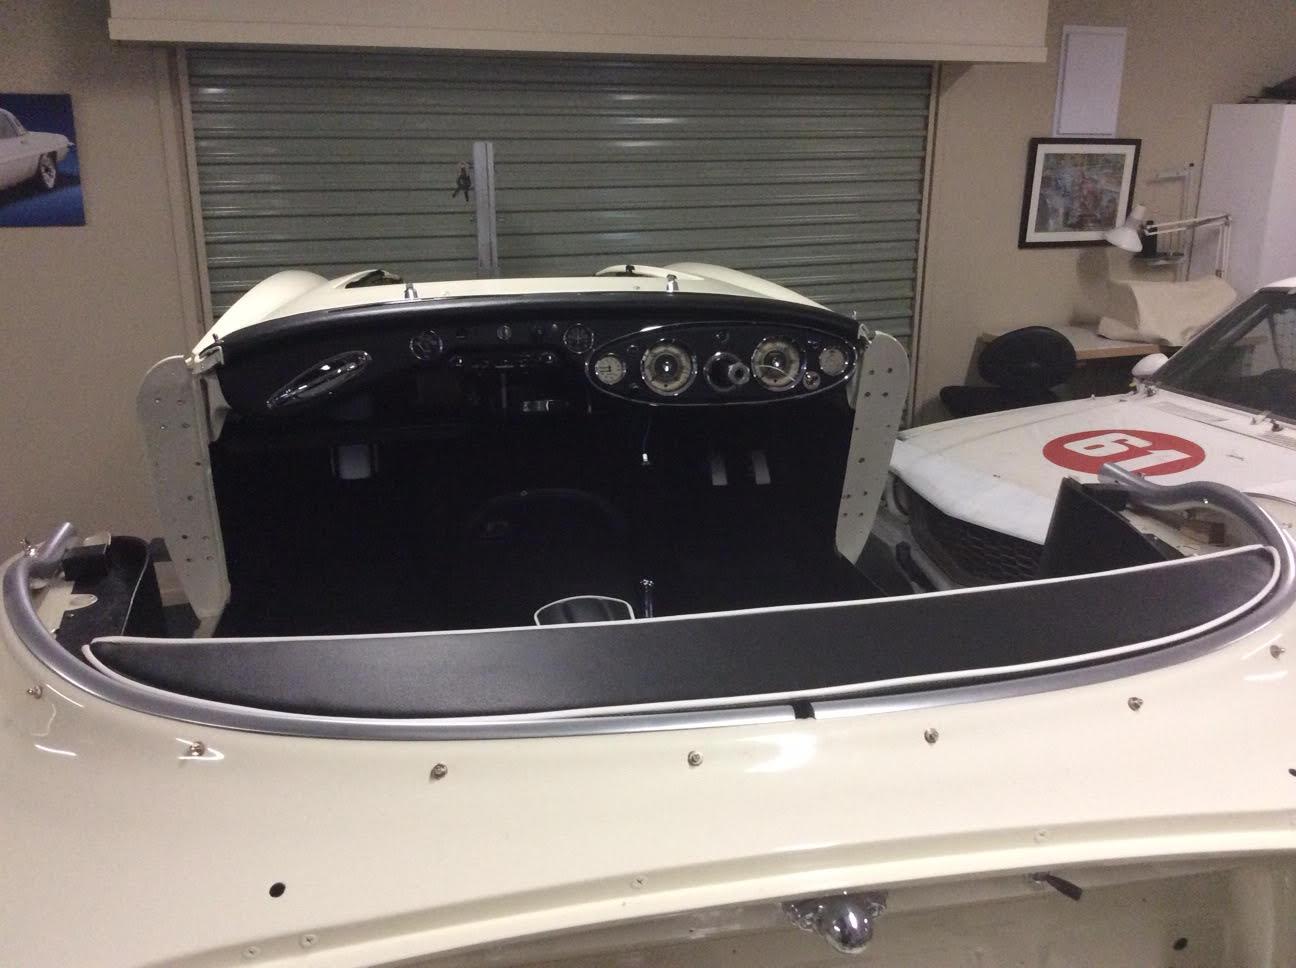 Name:  AH 3000 #258 Ruddspeed McLoughlin Hicks cockpit - Restoration 2017-19 2 interior Myles Hicks  (3.jpg Views: 126 Size:  112.6 KB